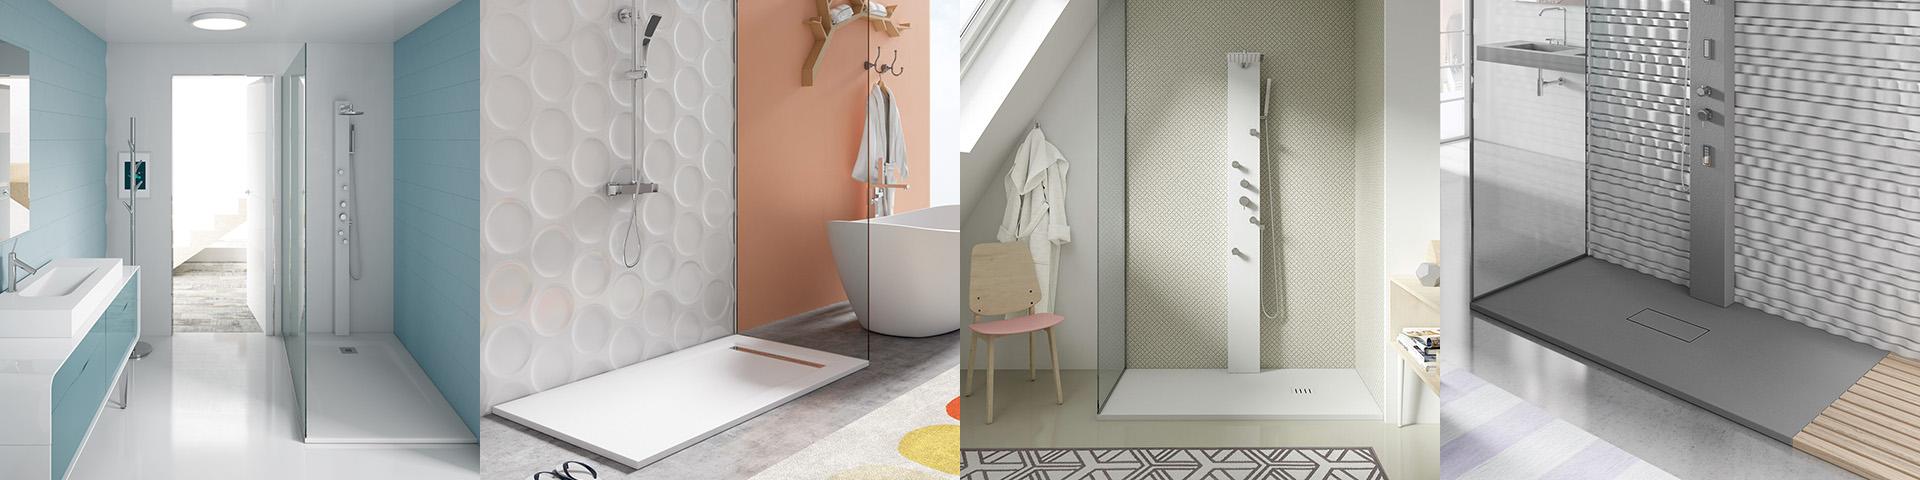 Blog Platos de ducha de Resina